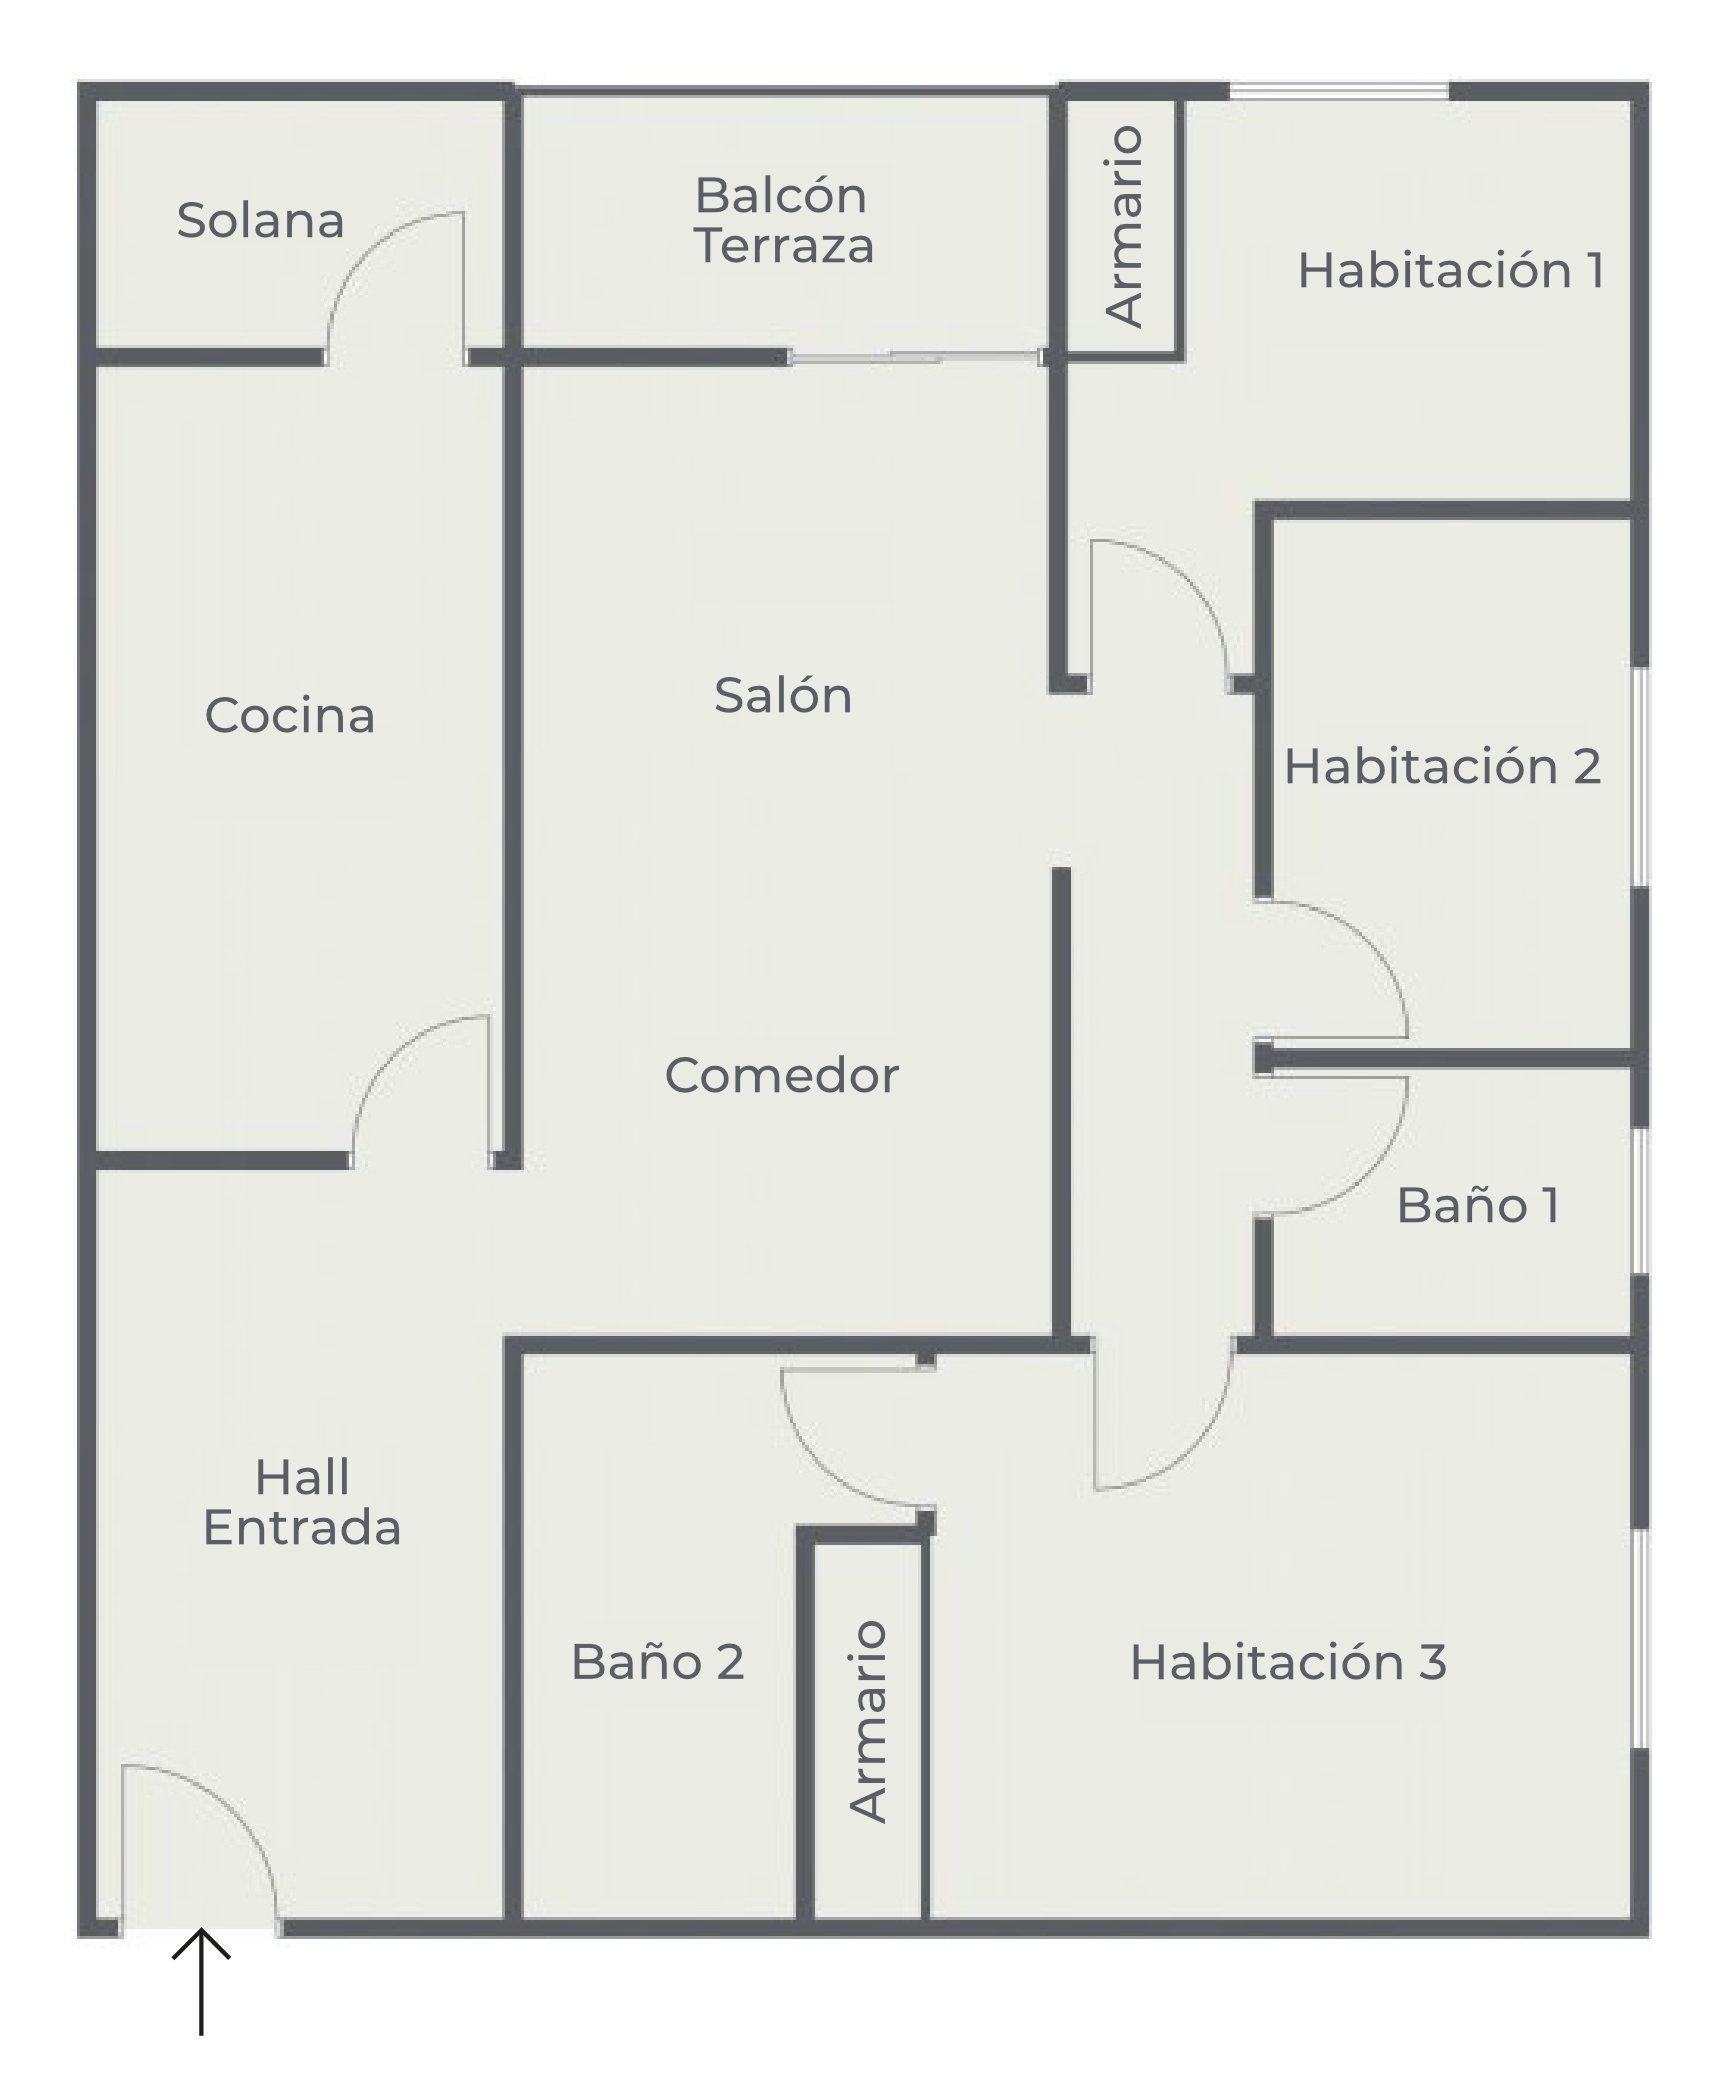 Las Galletas - Edificio Lavanda - Plano